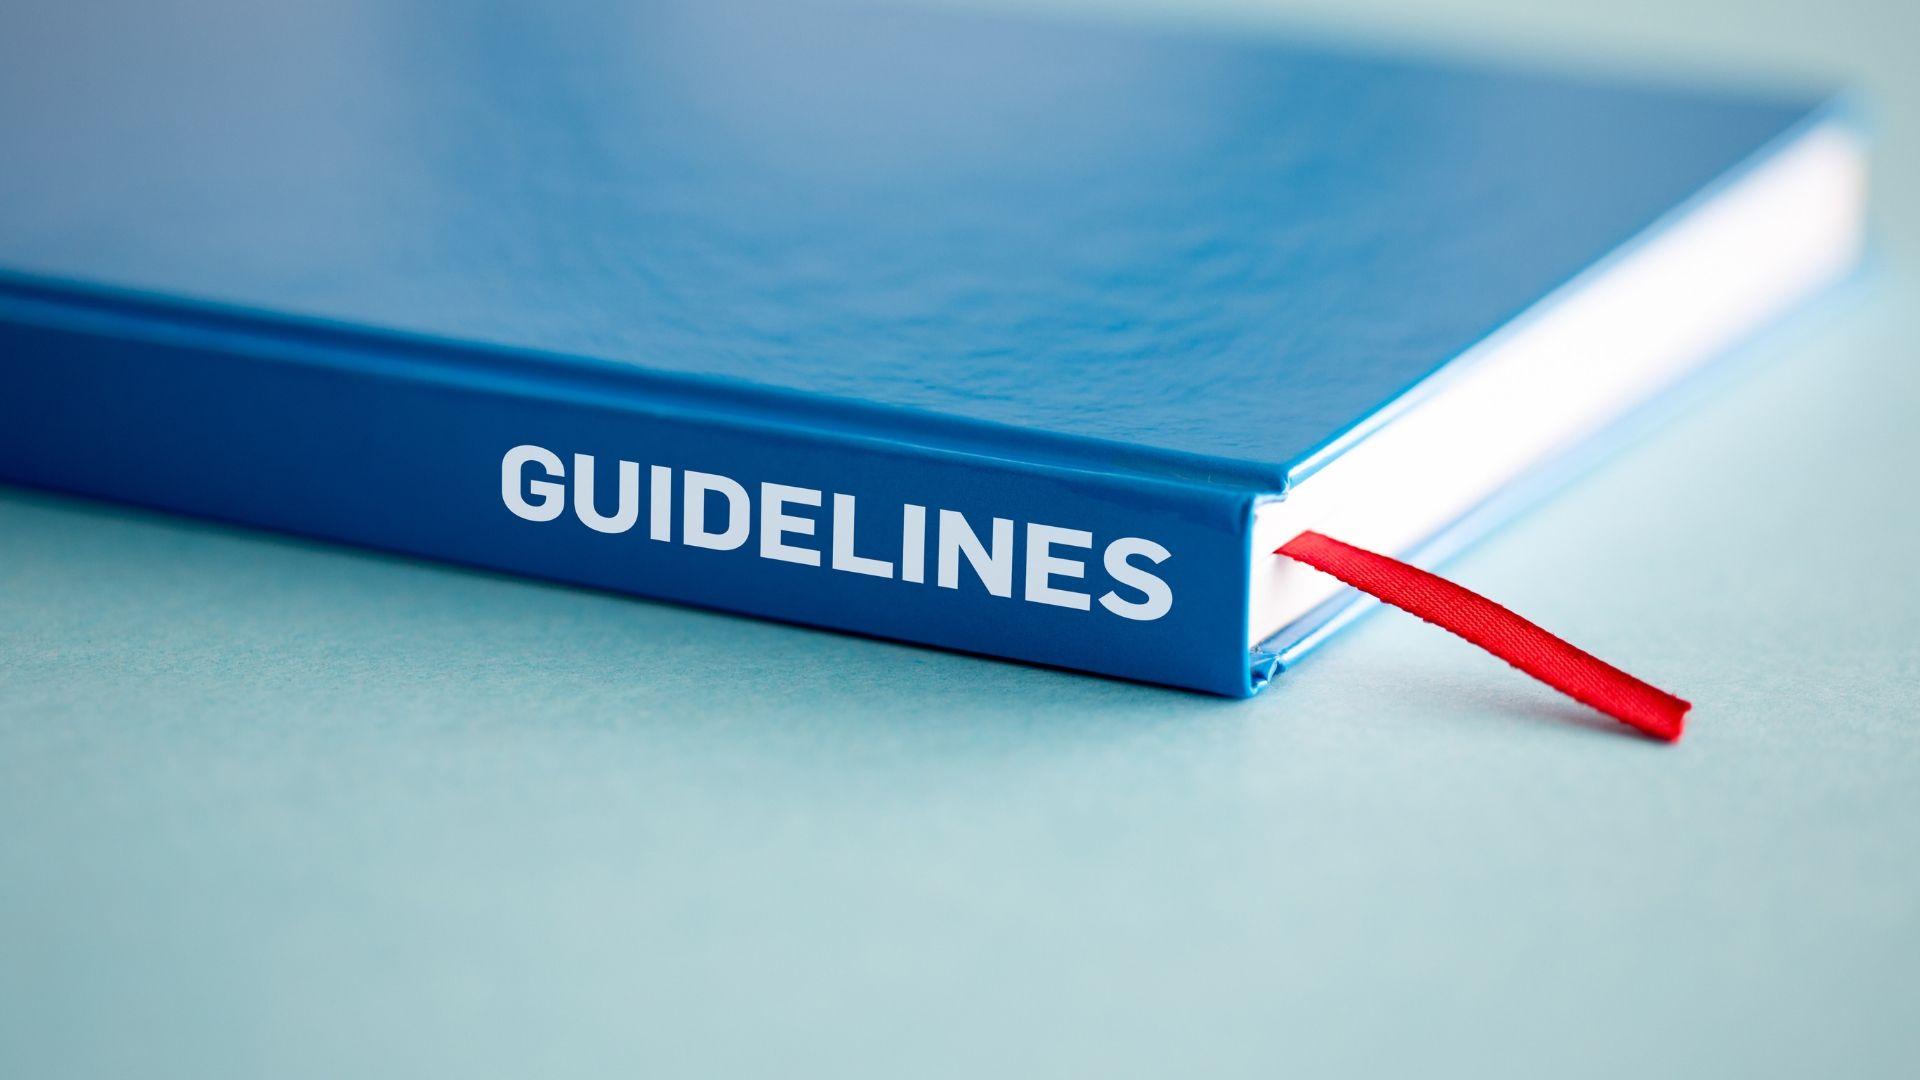 bioplastic guidelines